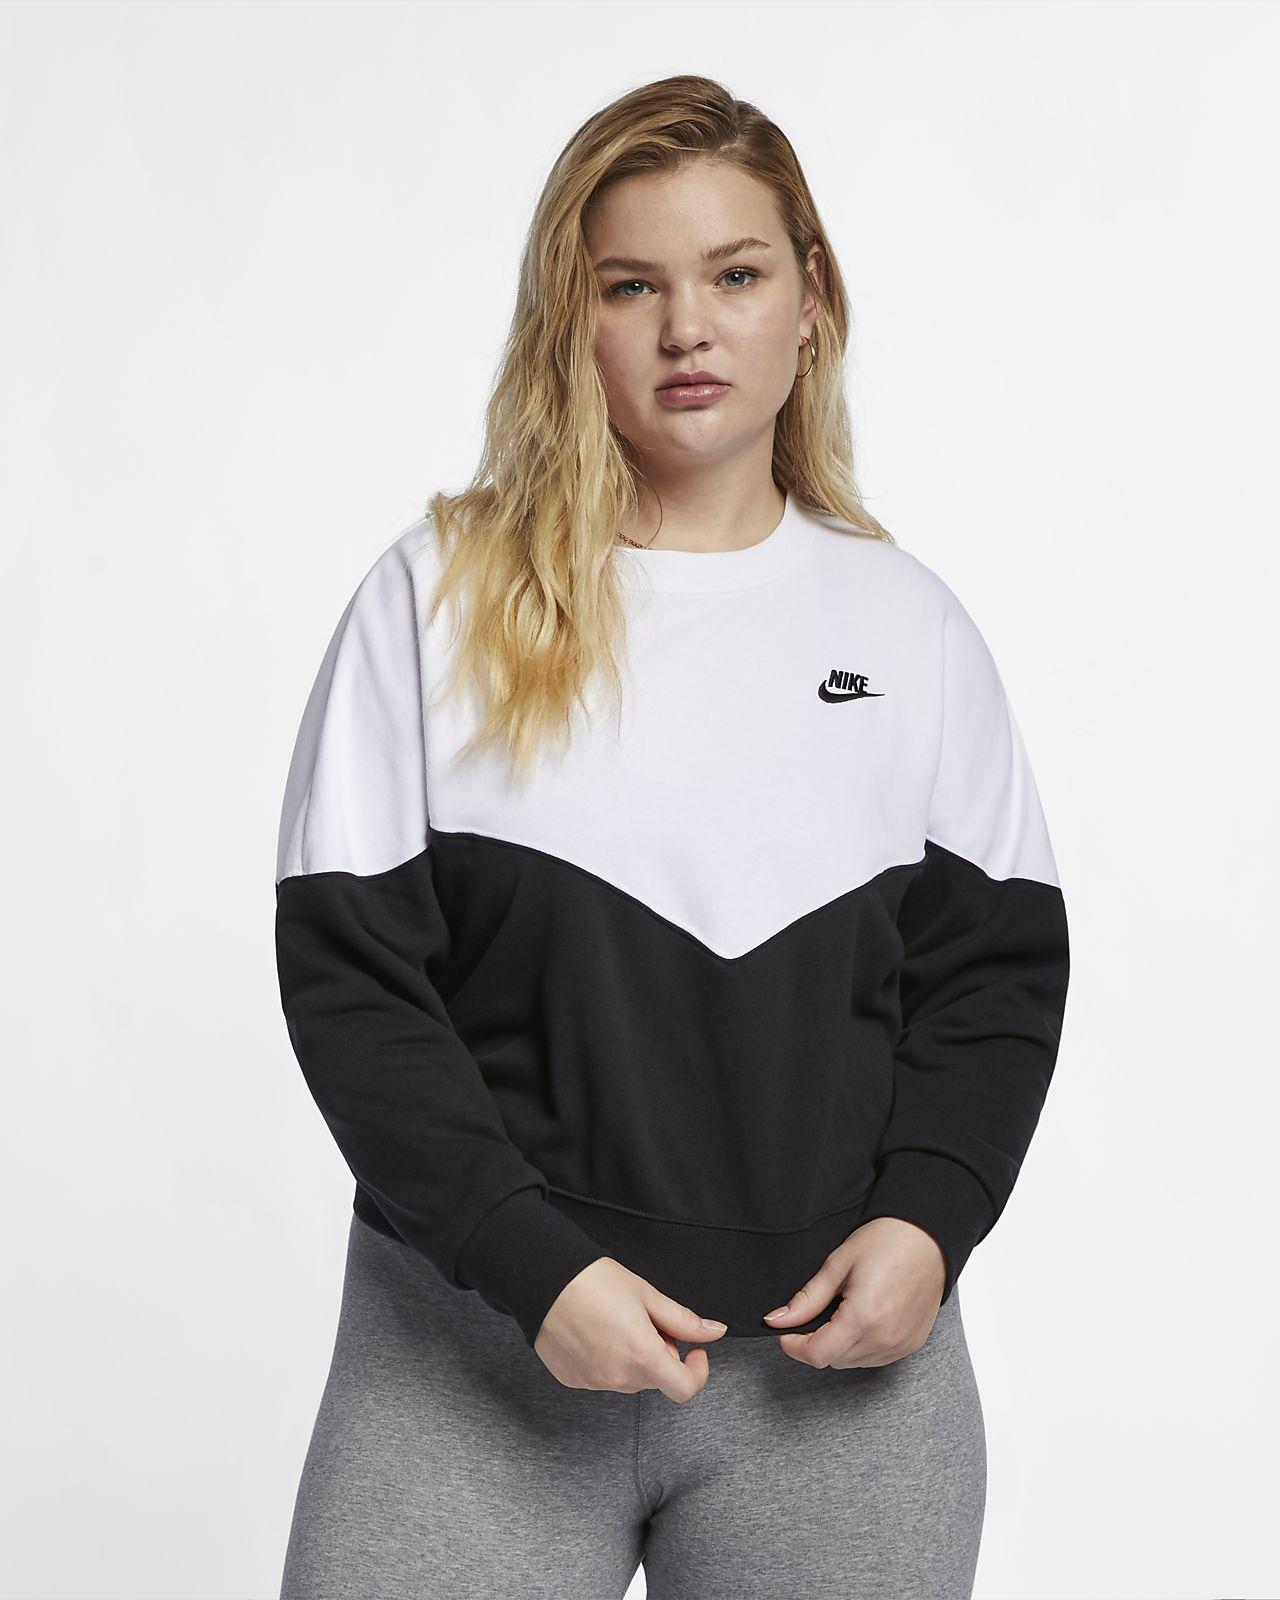 524cf9ae Nike Sportswear Heritage Women's Fleece Crew (Plus Size). Nike.com GB